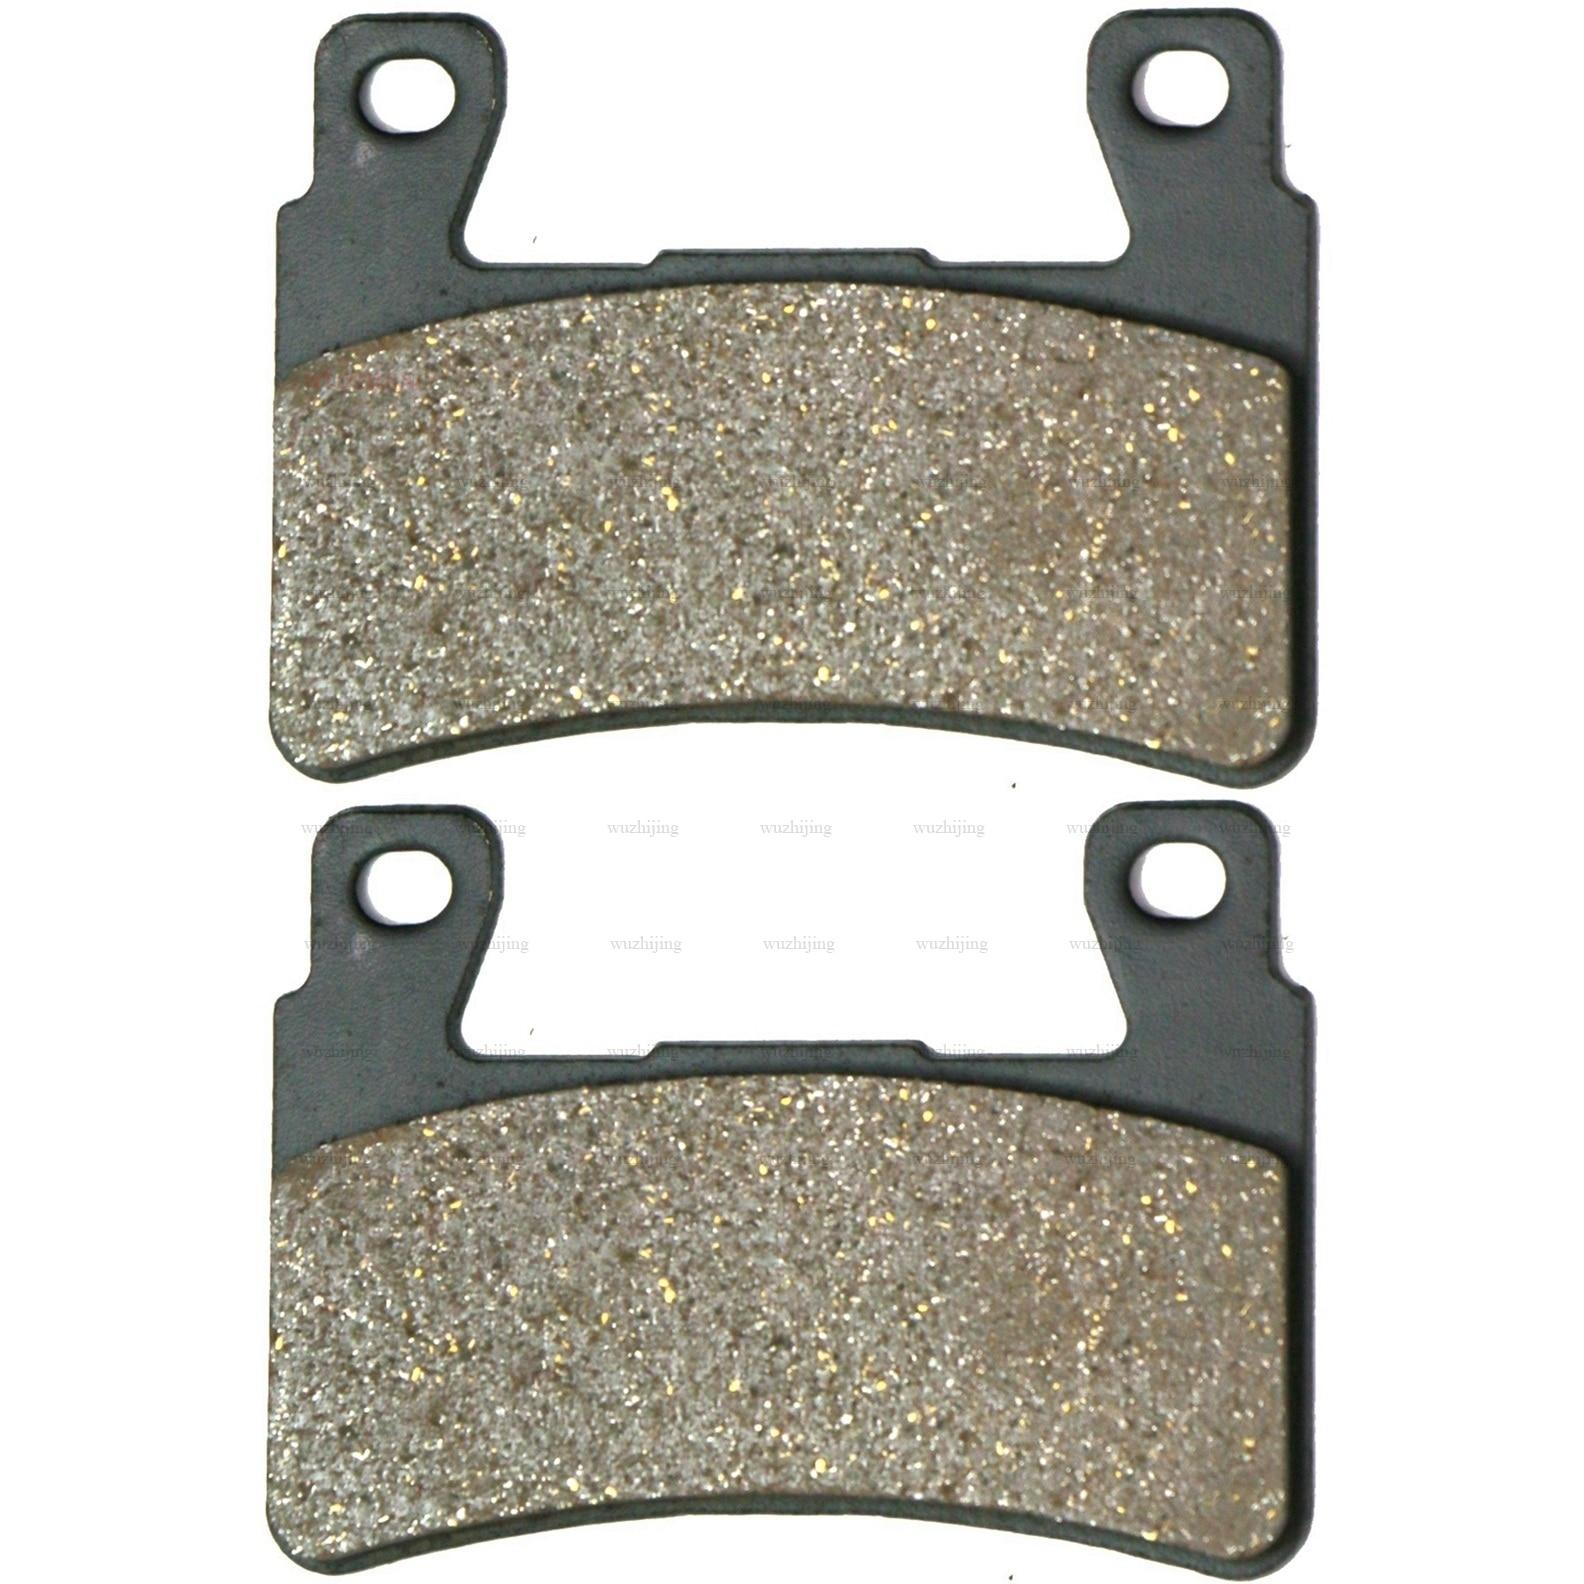 Brake Pad Set for GD 250 N R (13-16) 450 EXIV (16) GT 650 Comet RC P (14) iR (15-16) GV 300 (16)